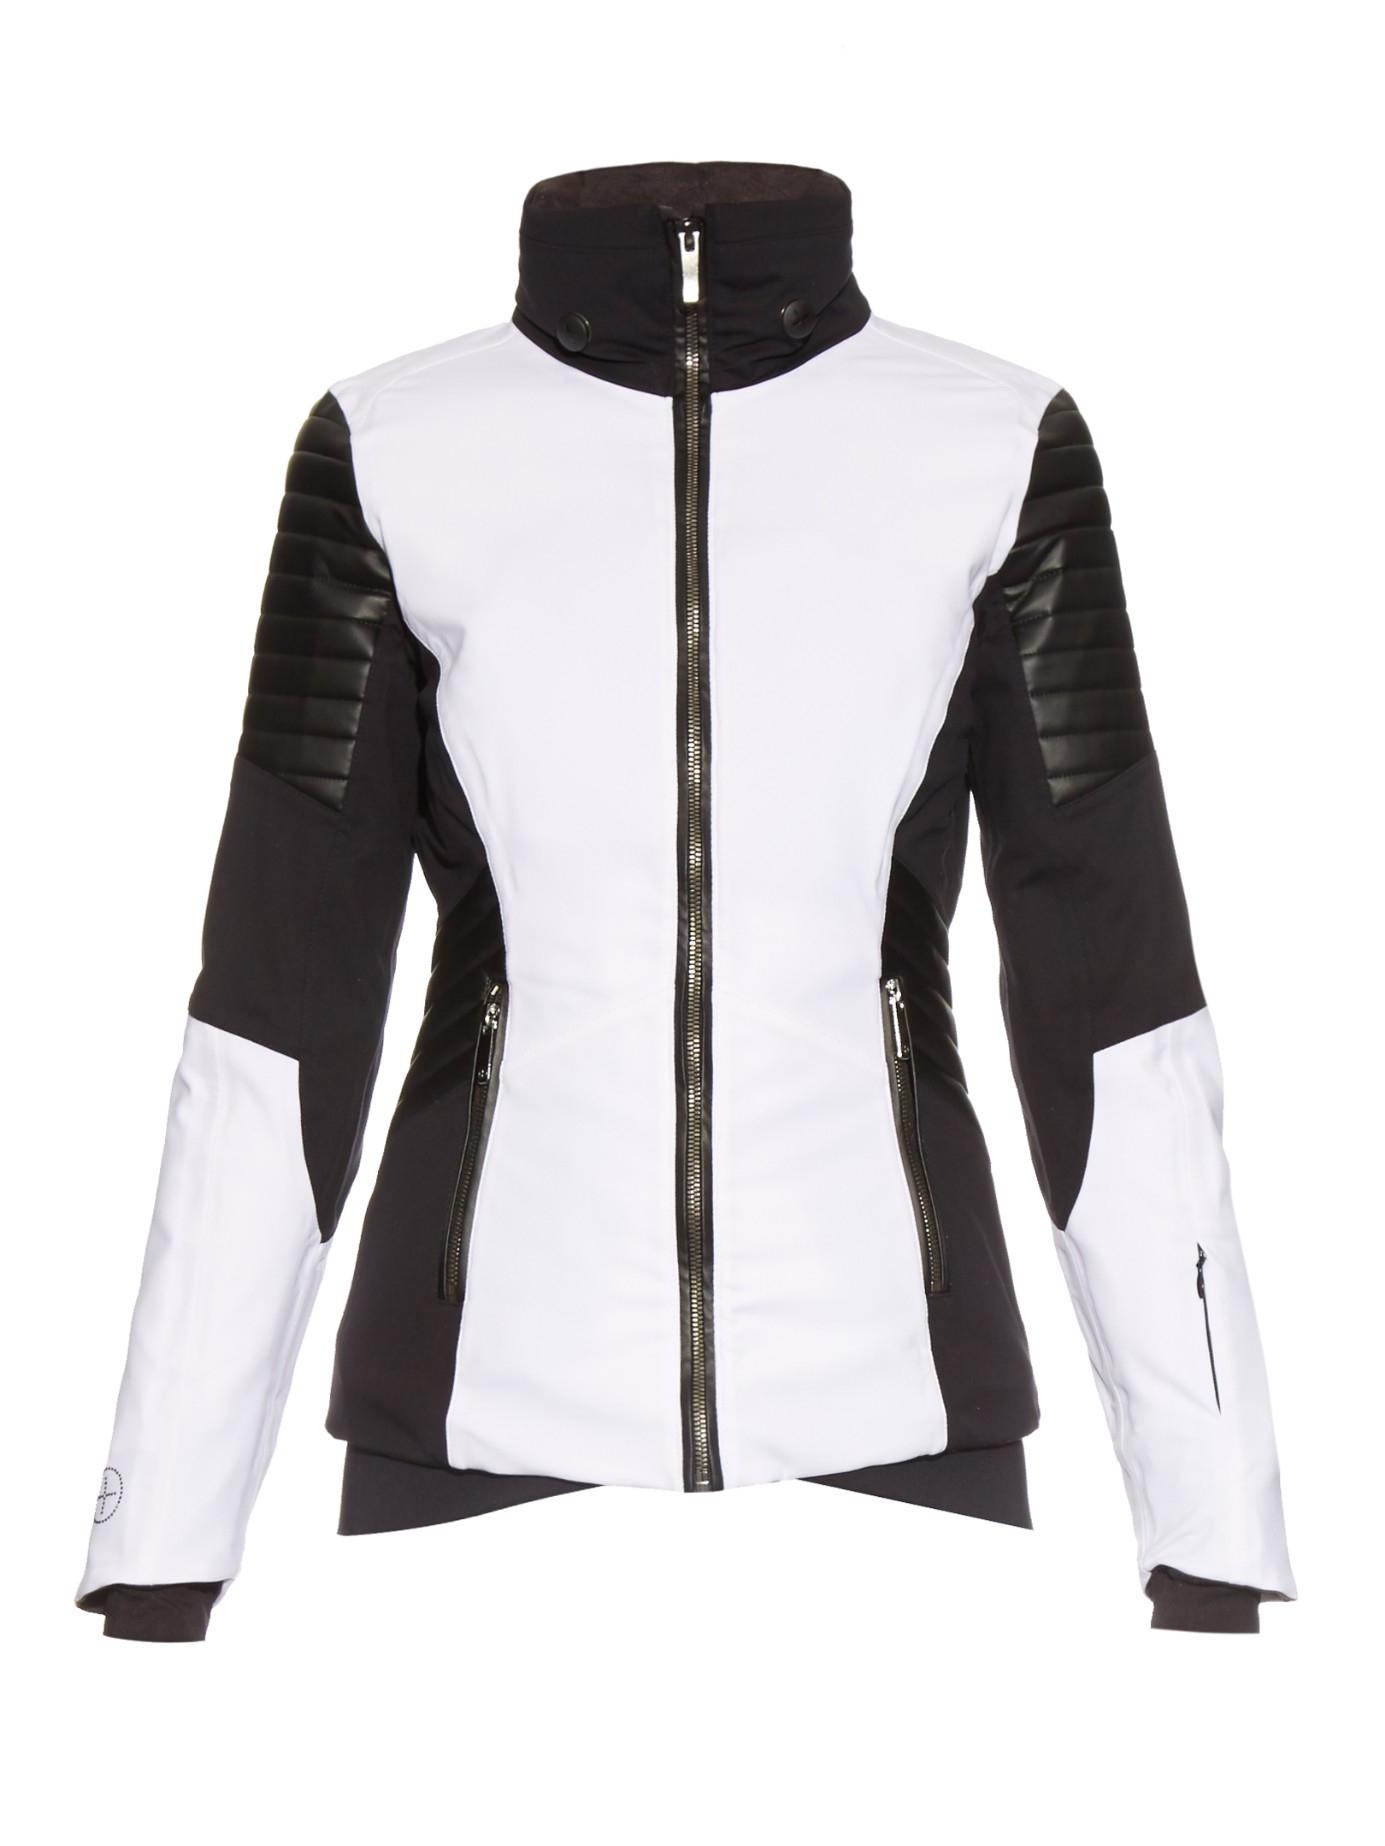 9f2777799d82 In Lyst Distinction White Lacroix Ski Jacket Water Resistant XdqFx0U